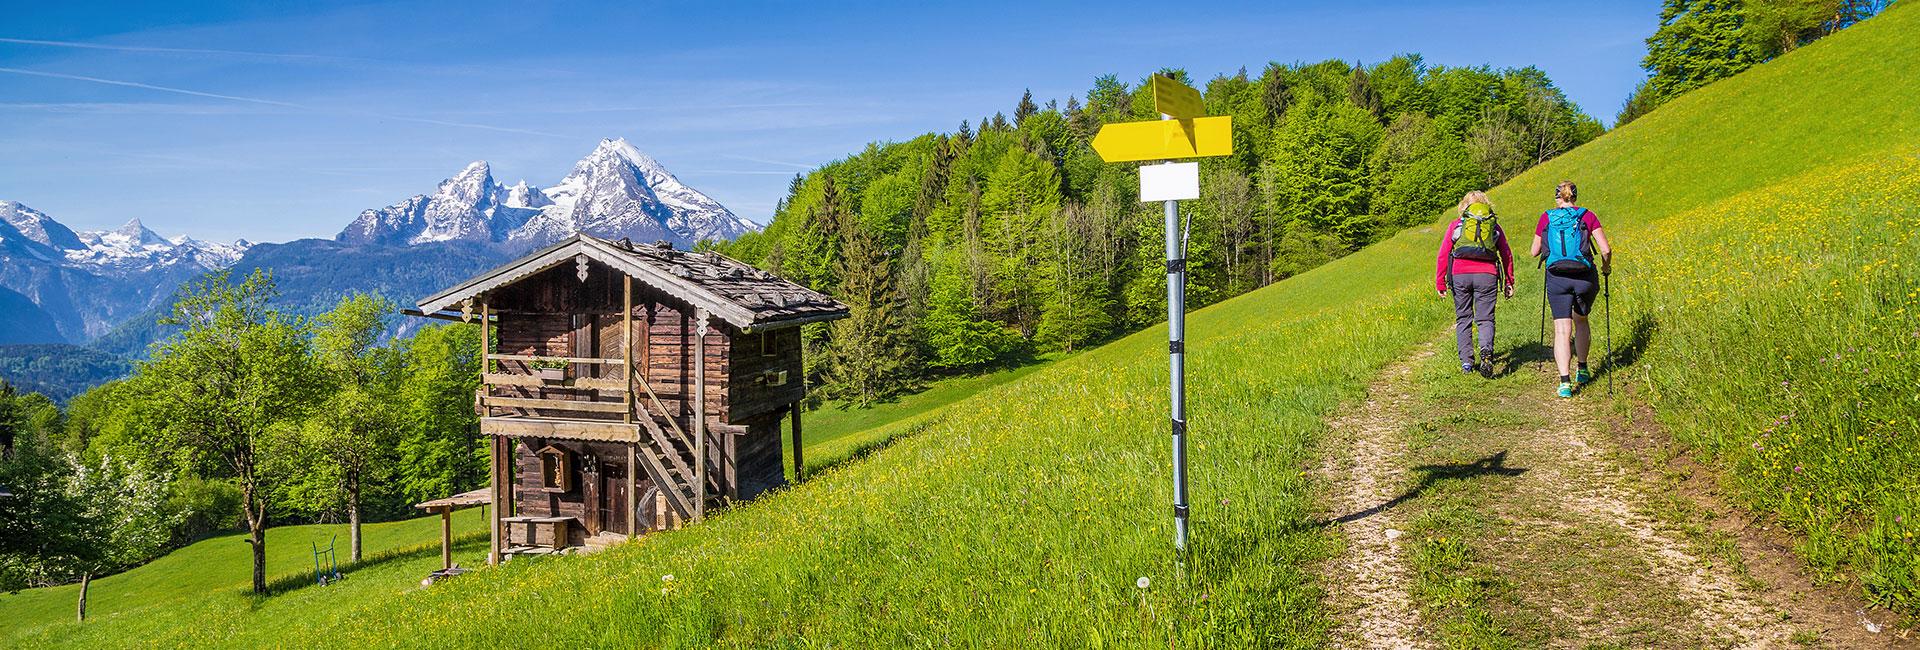 Ausflugsziele im Salzburger Land - Bauernhofurlaub am Blankgut in Wagrain